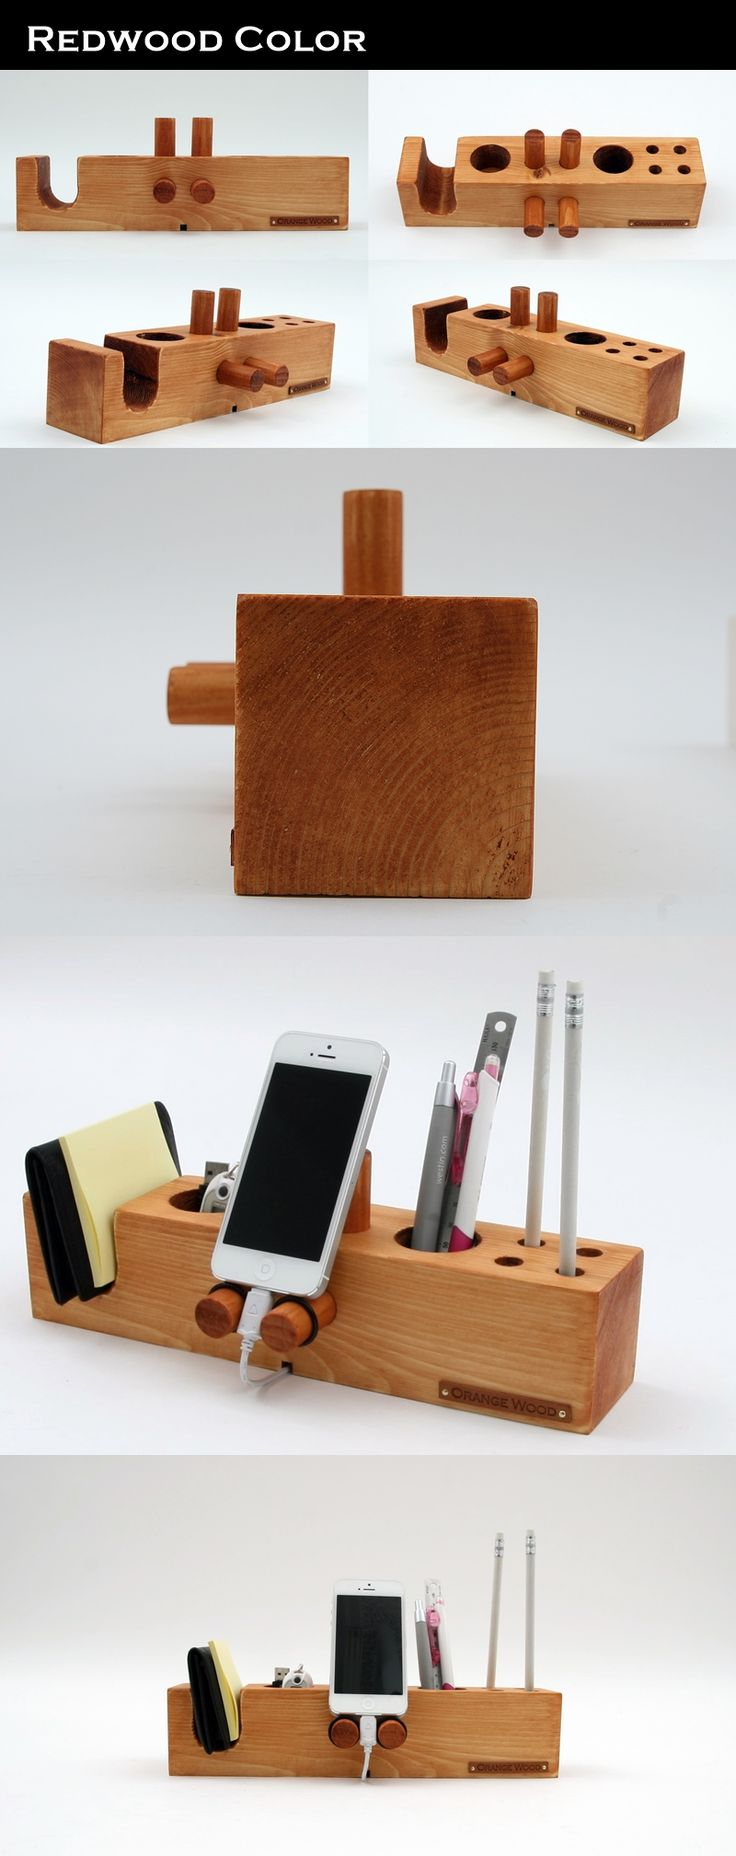 Phone,walnut and pencil holder